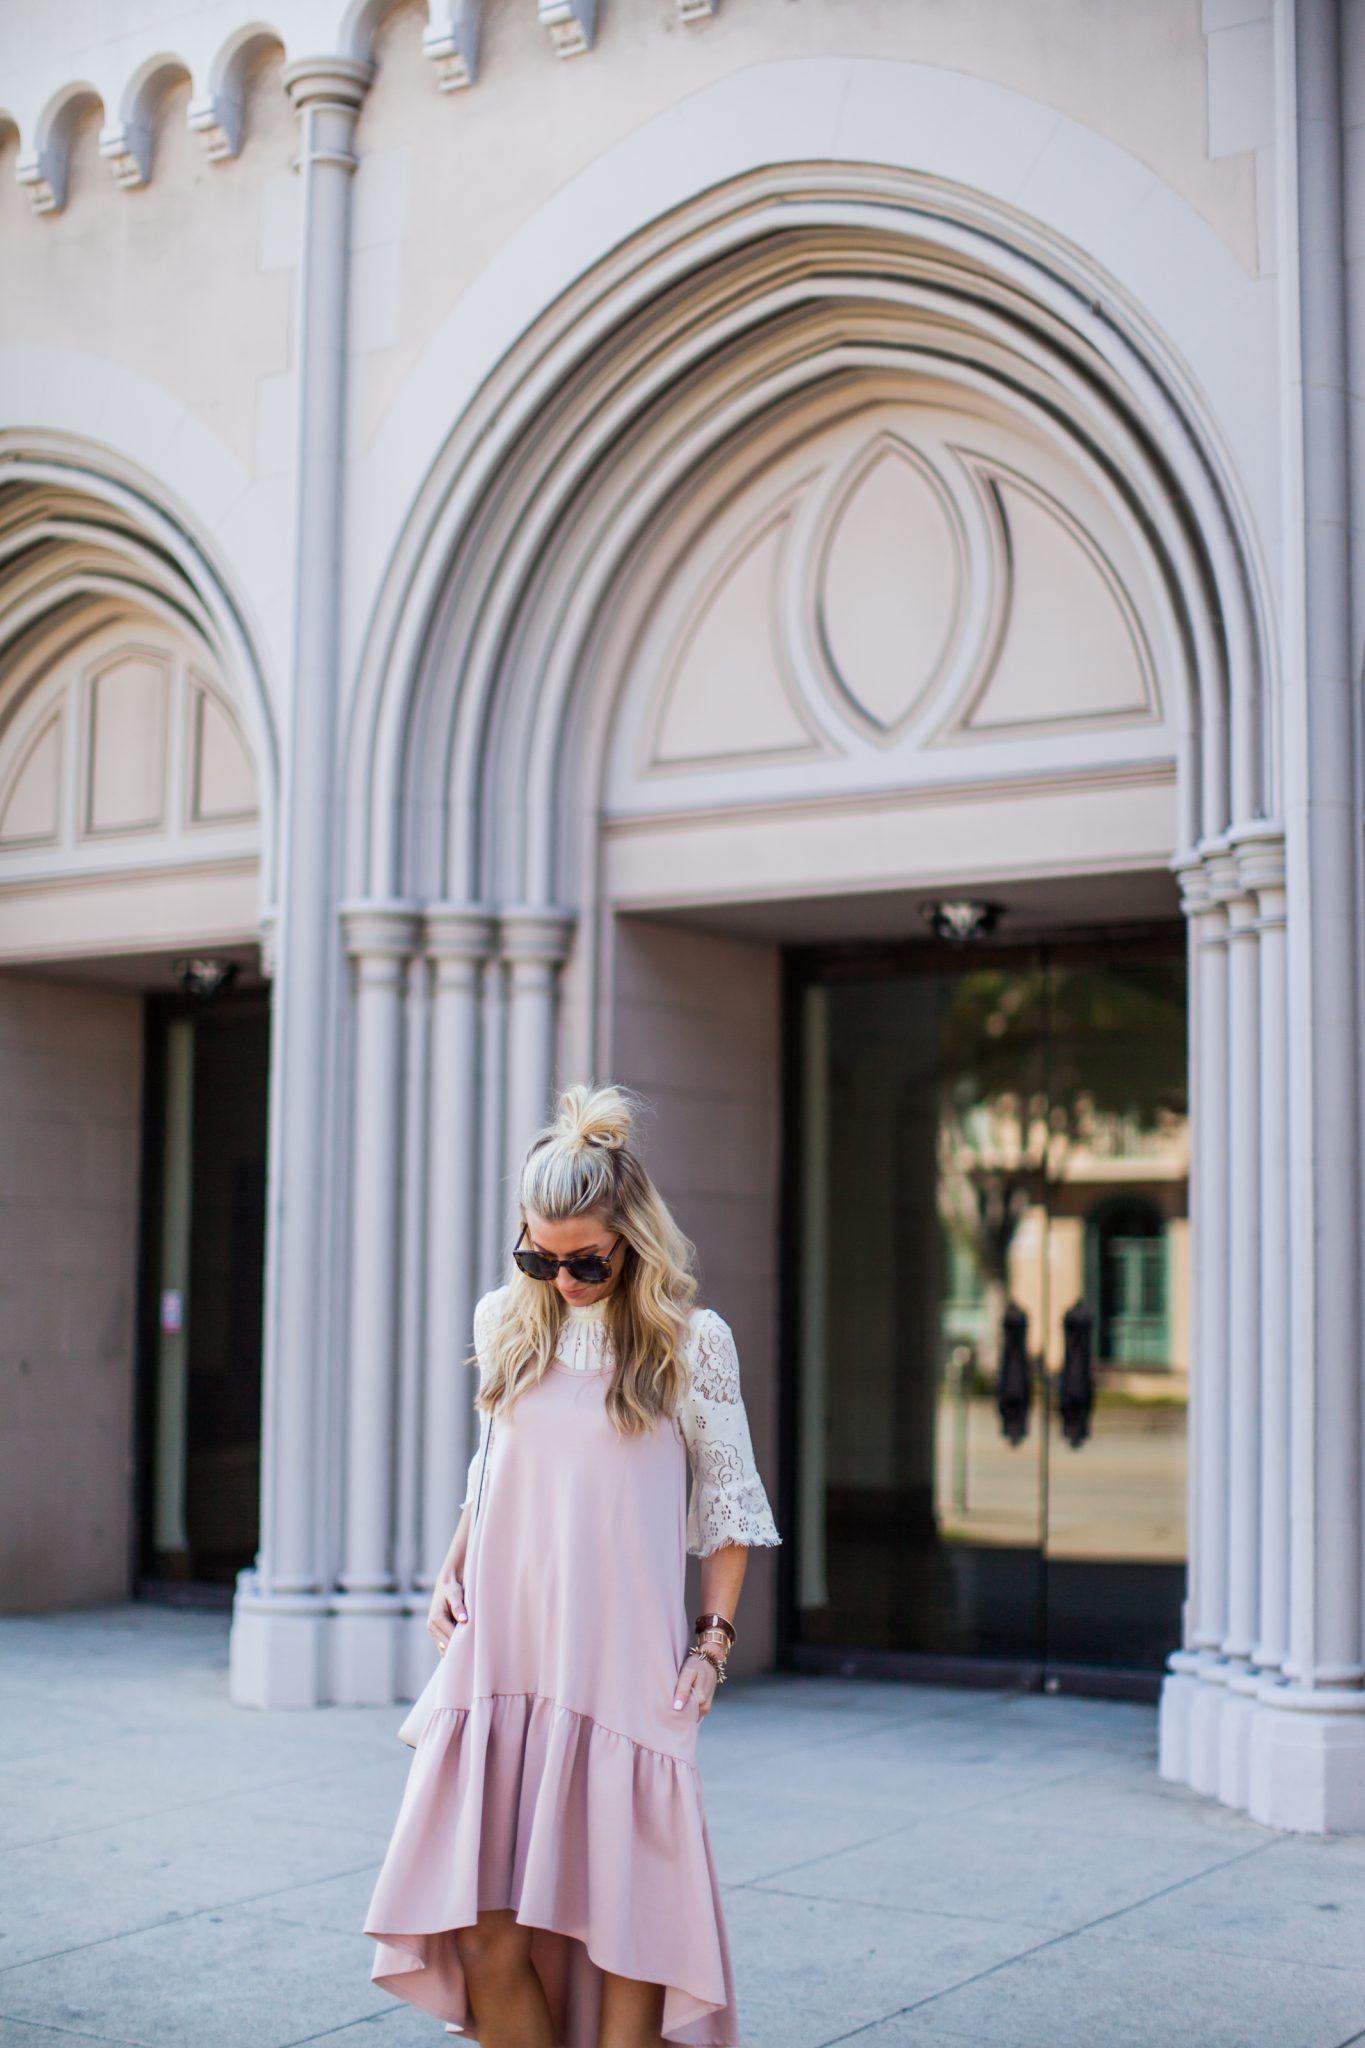 Blush ruffle drop waist dress + lace top